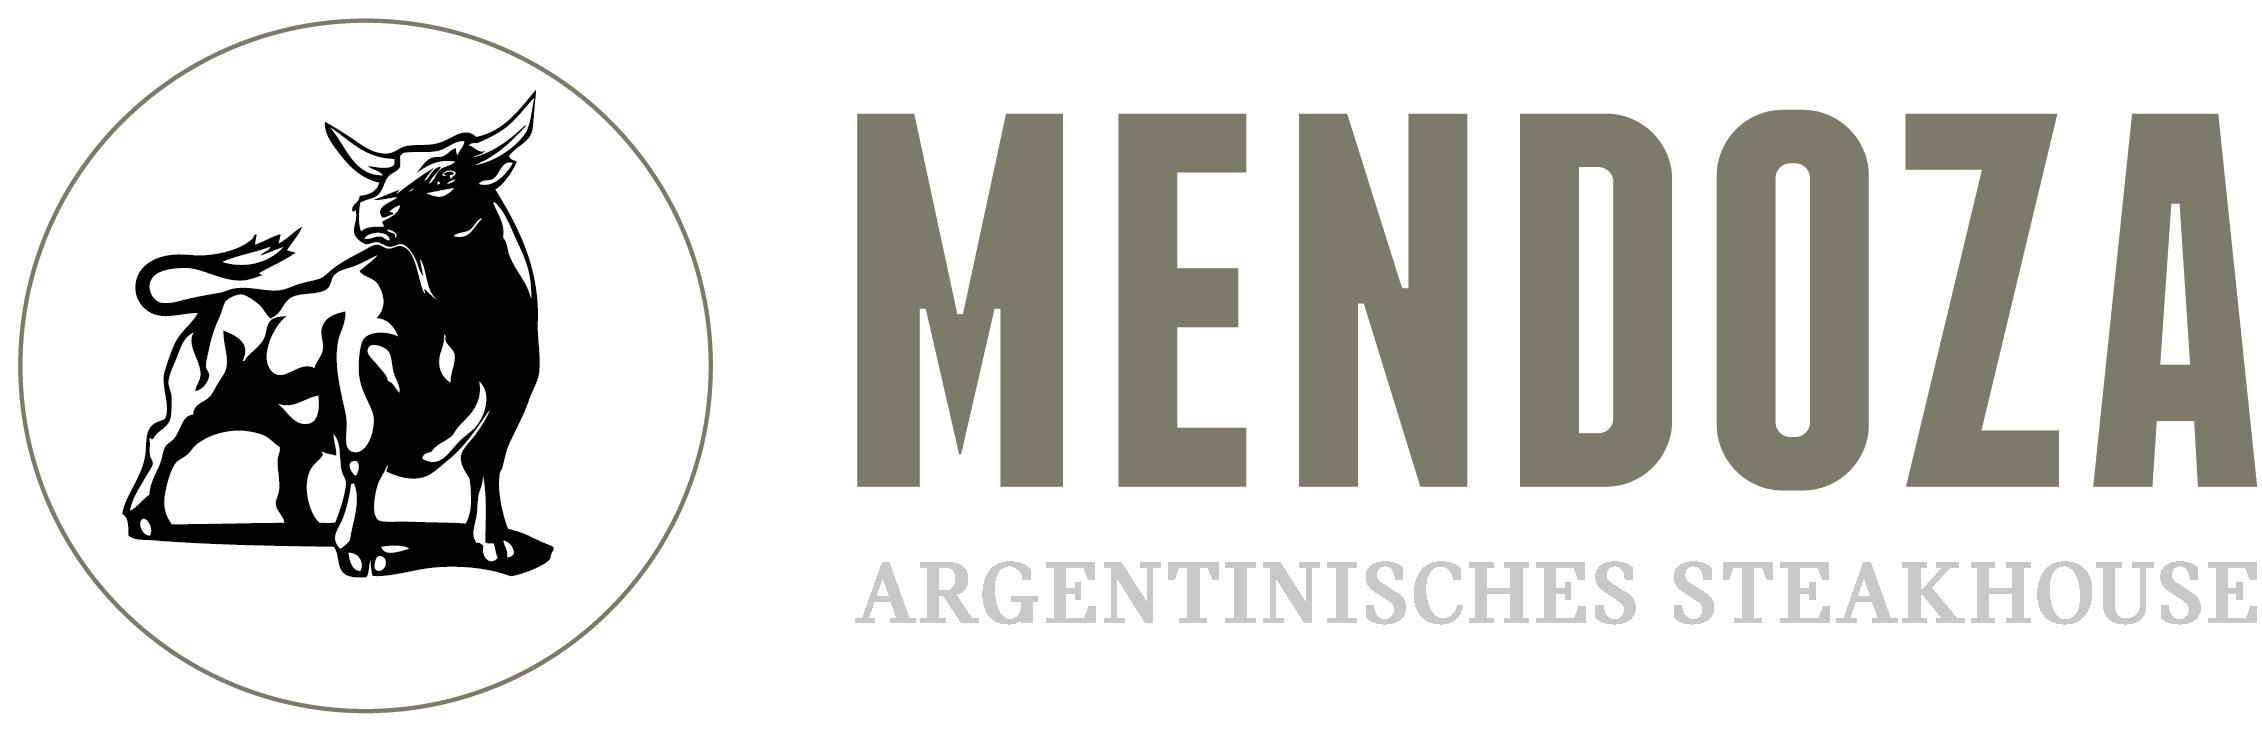 Mendoza Steakhouse Logo